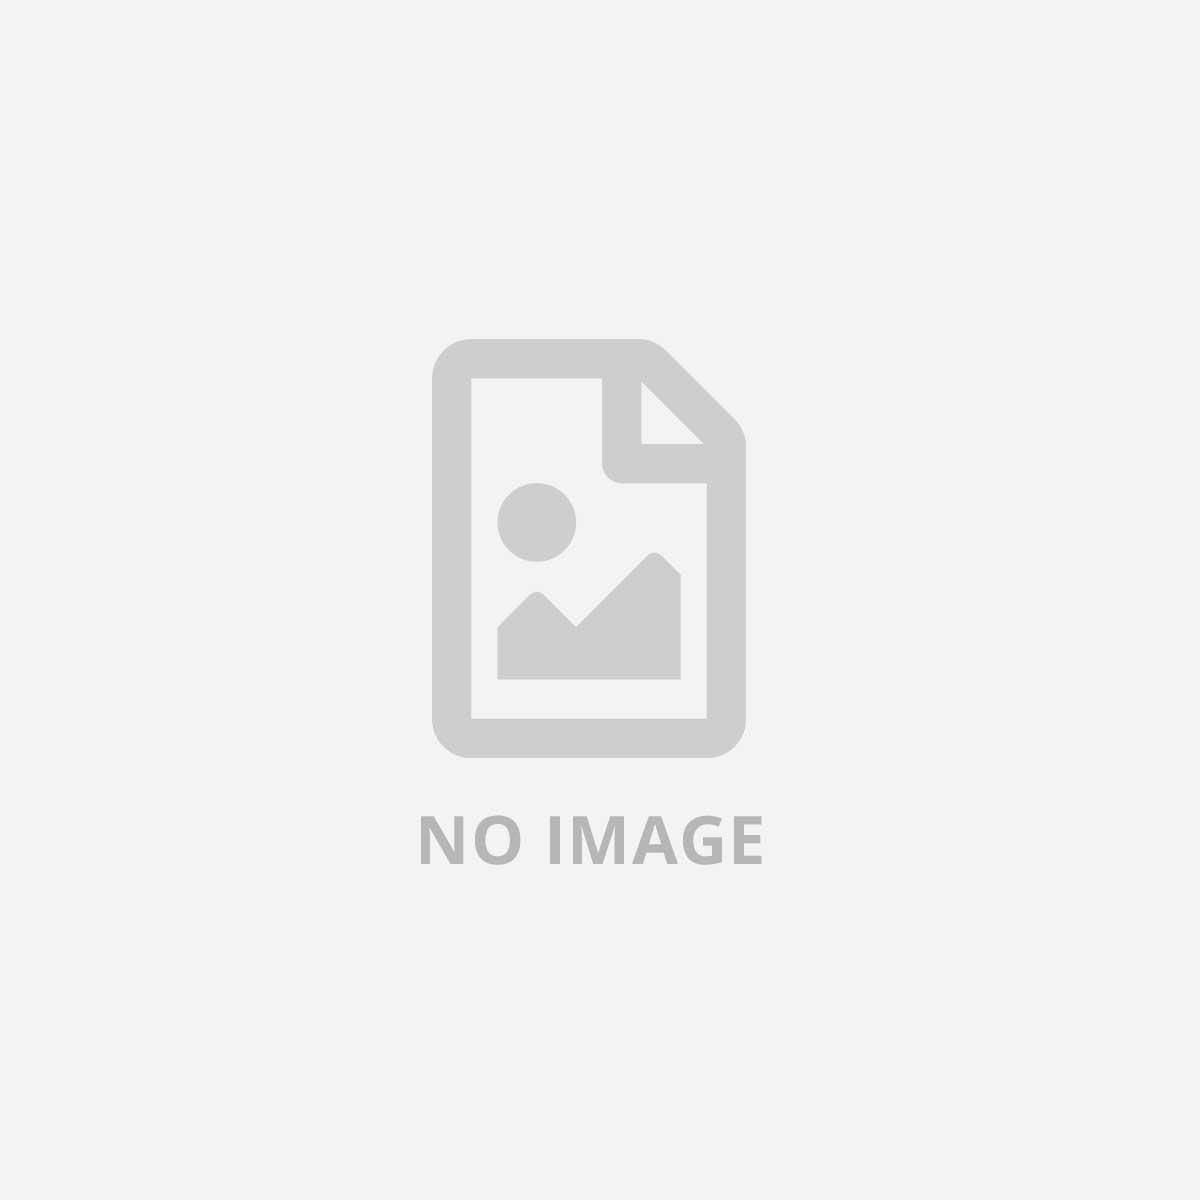 SEAGATE BASIC BLACK USB3.0 2.5 1000GB